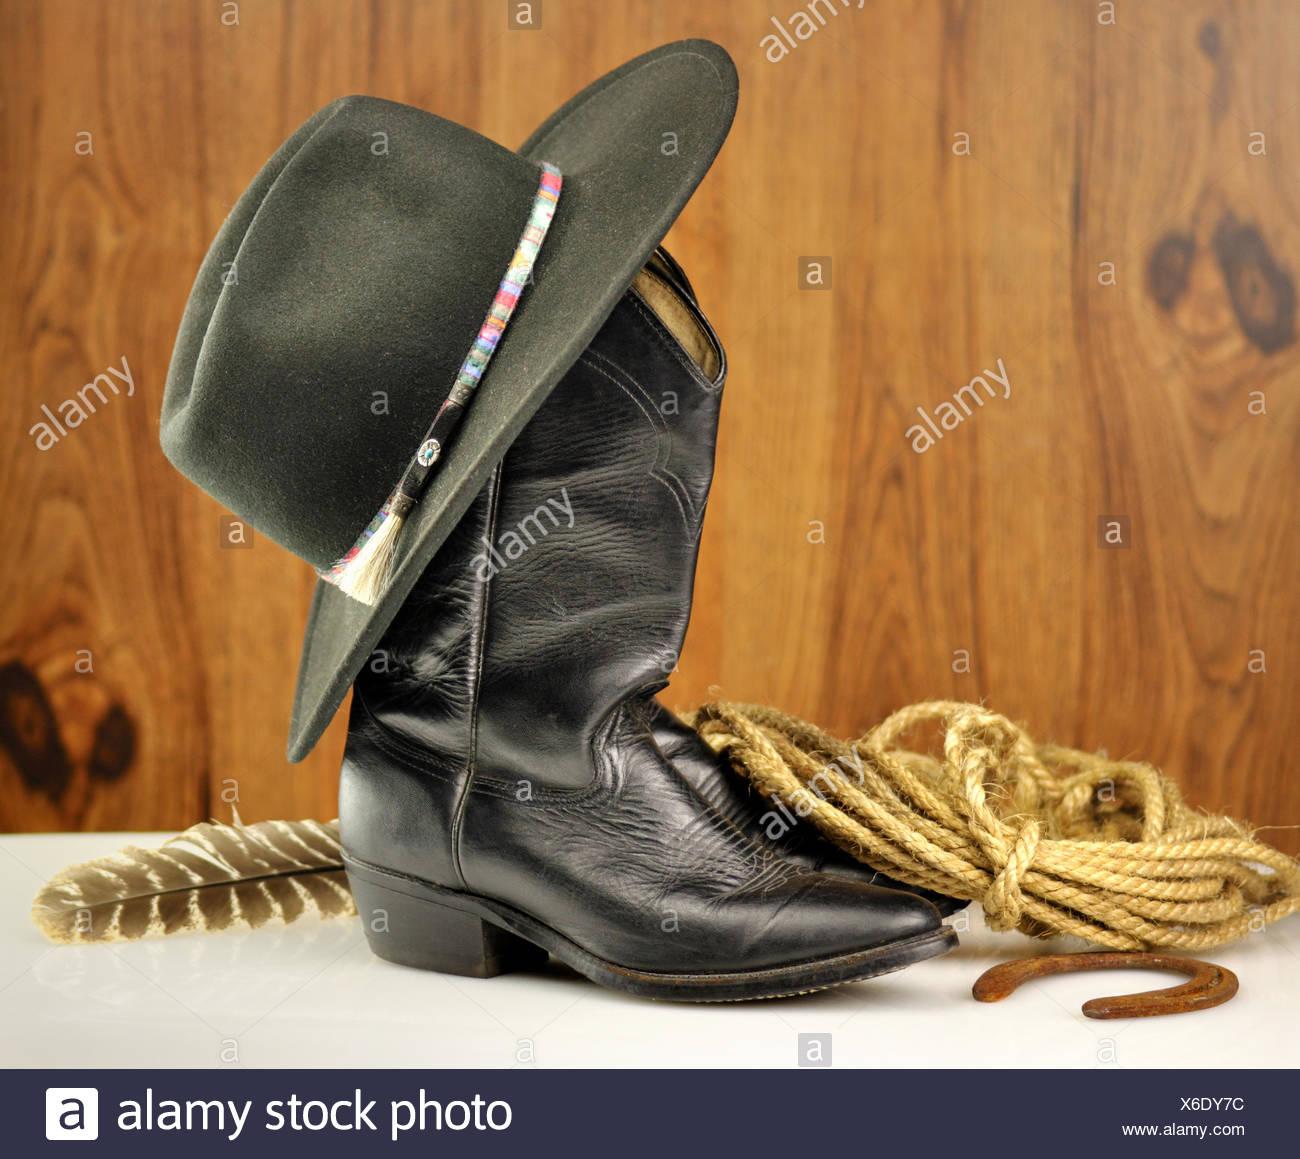 Tolle Cowboy Färbung Seite Fotos - Entry Level Resume Vorlagen ...